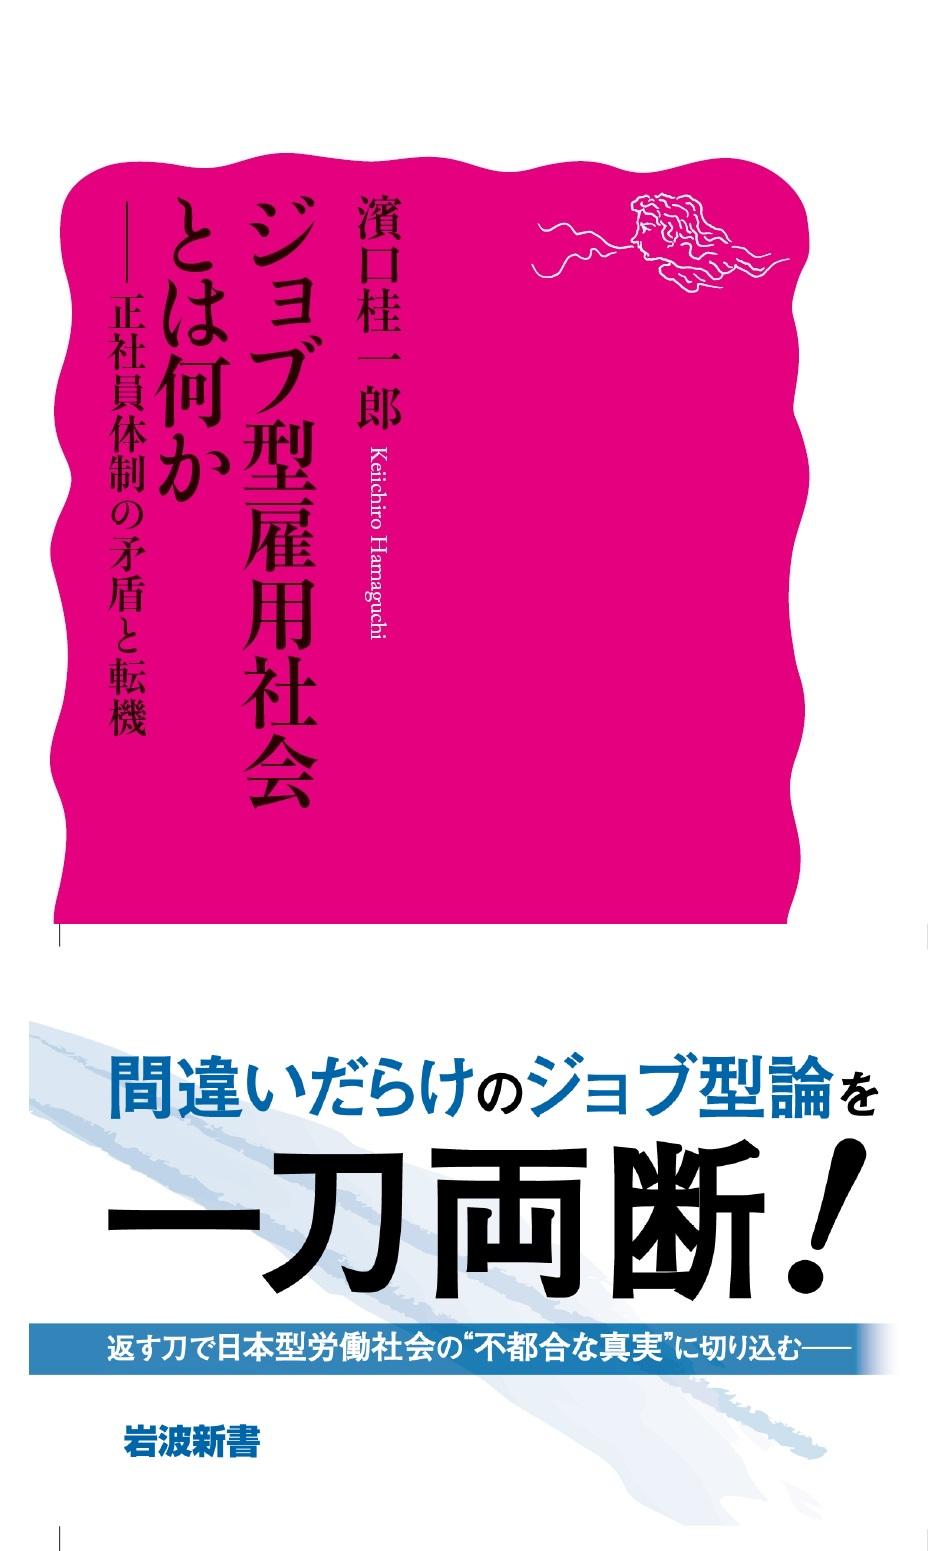 Iwanami_20210820222001